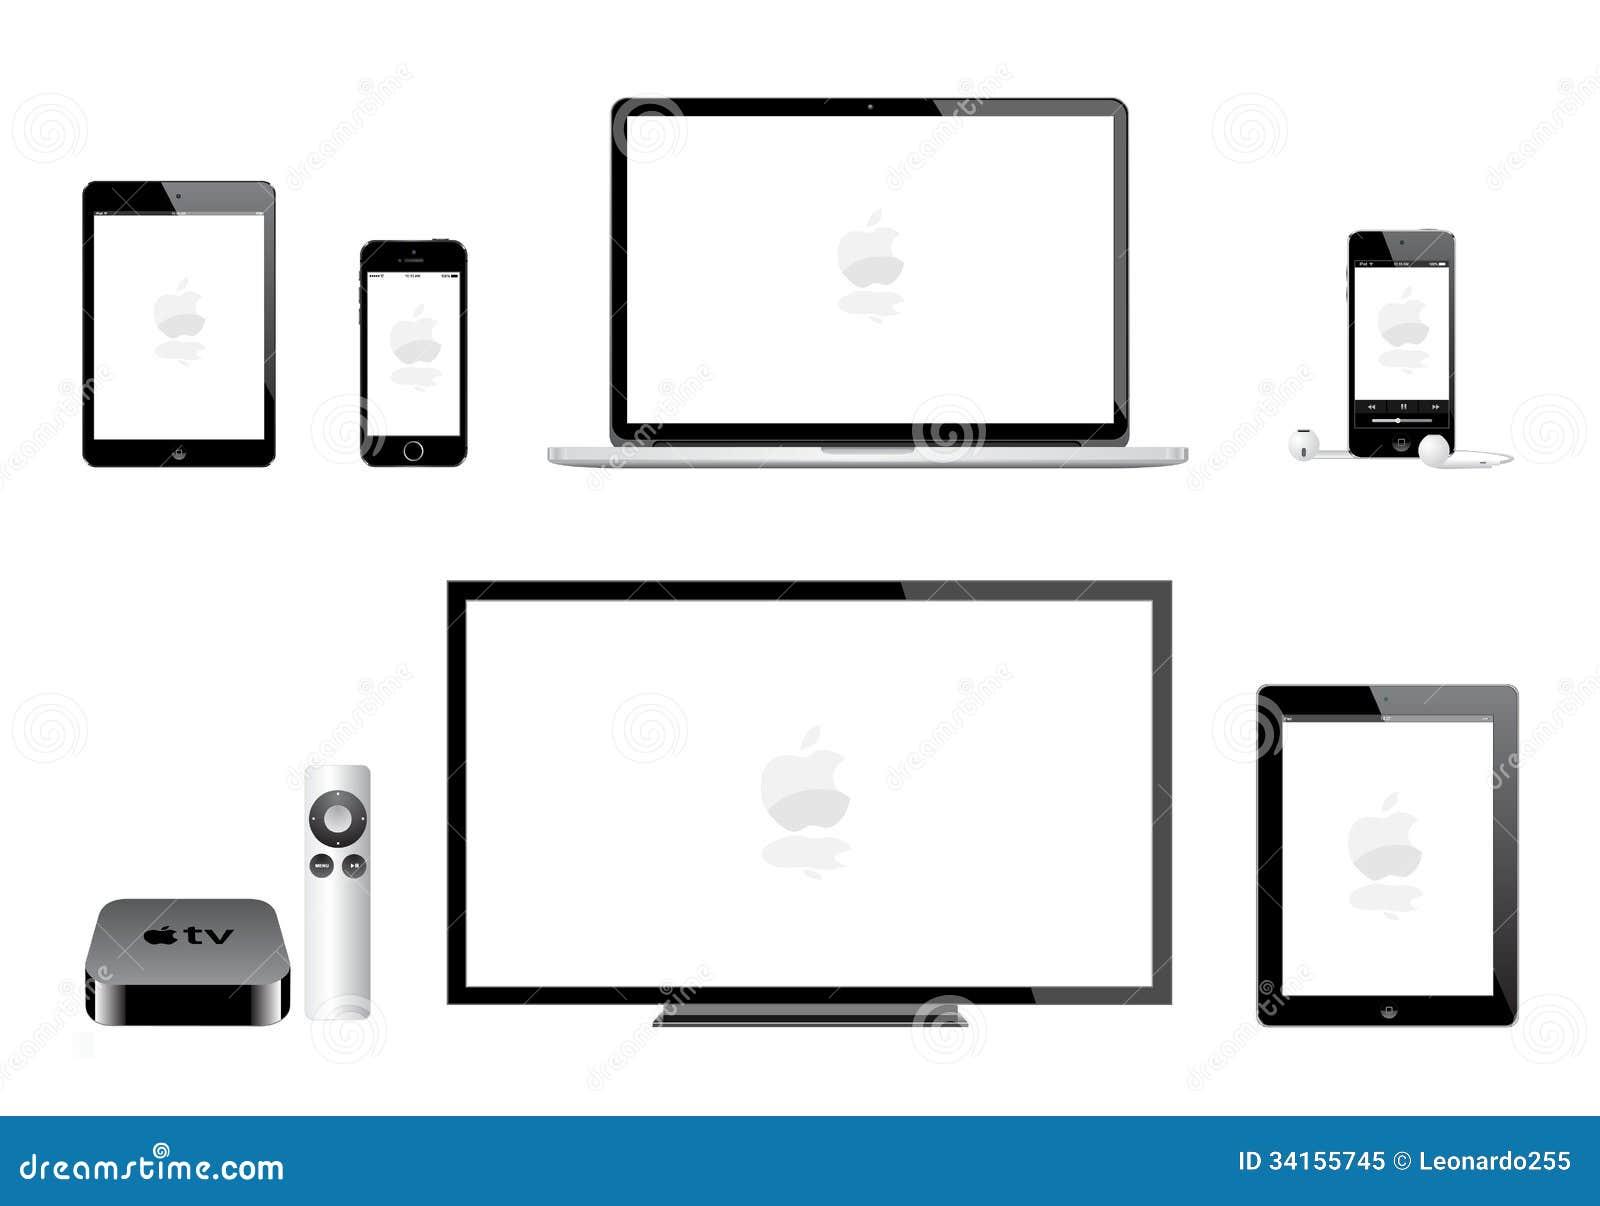 Apple Ipad Diagram Schematic Diagrams Mini Wiring Mac Tv Smart U2022 Animation